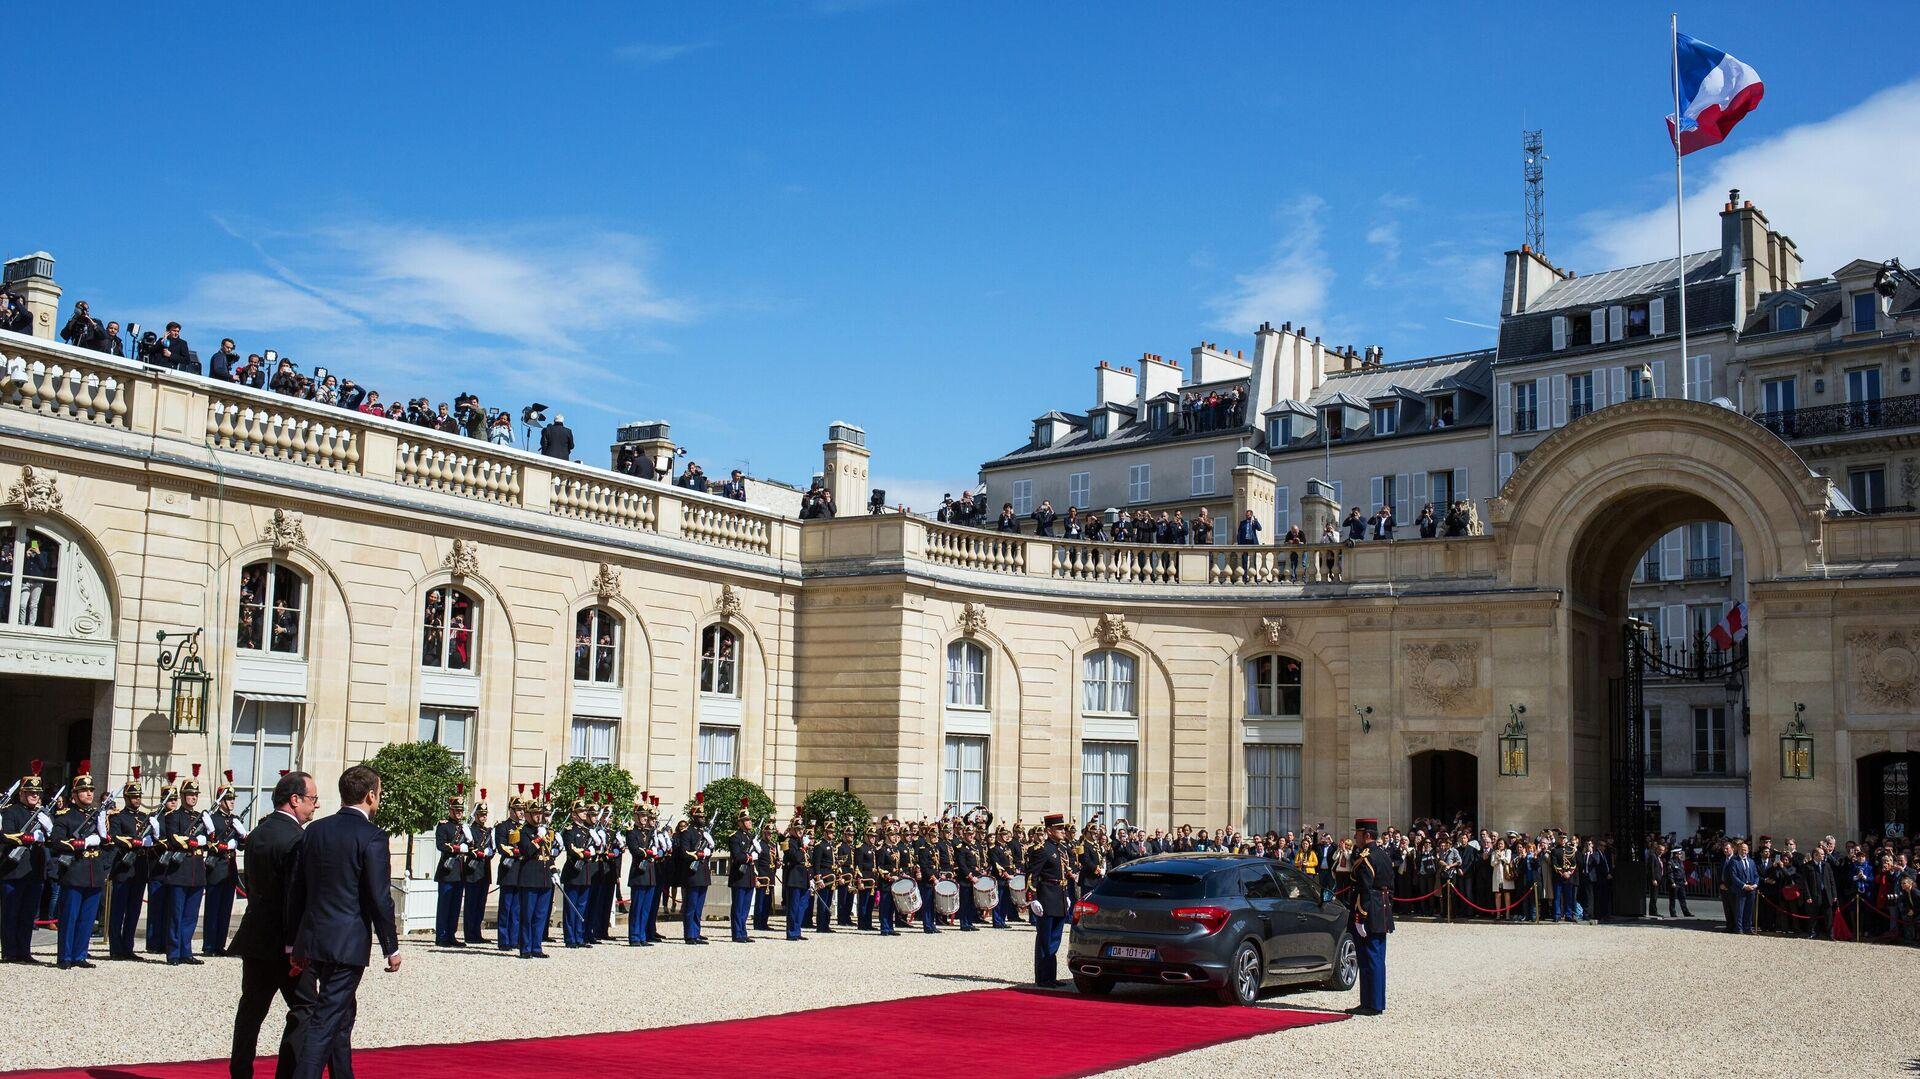 Élysée-Palast während der Amtseinführung von Emmanuel Macron (Archivbild) - SNA, 1920, 31.05.2021